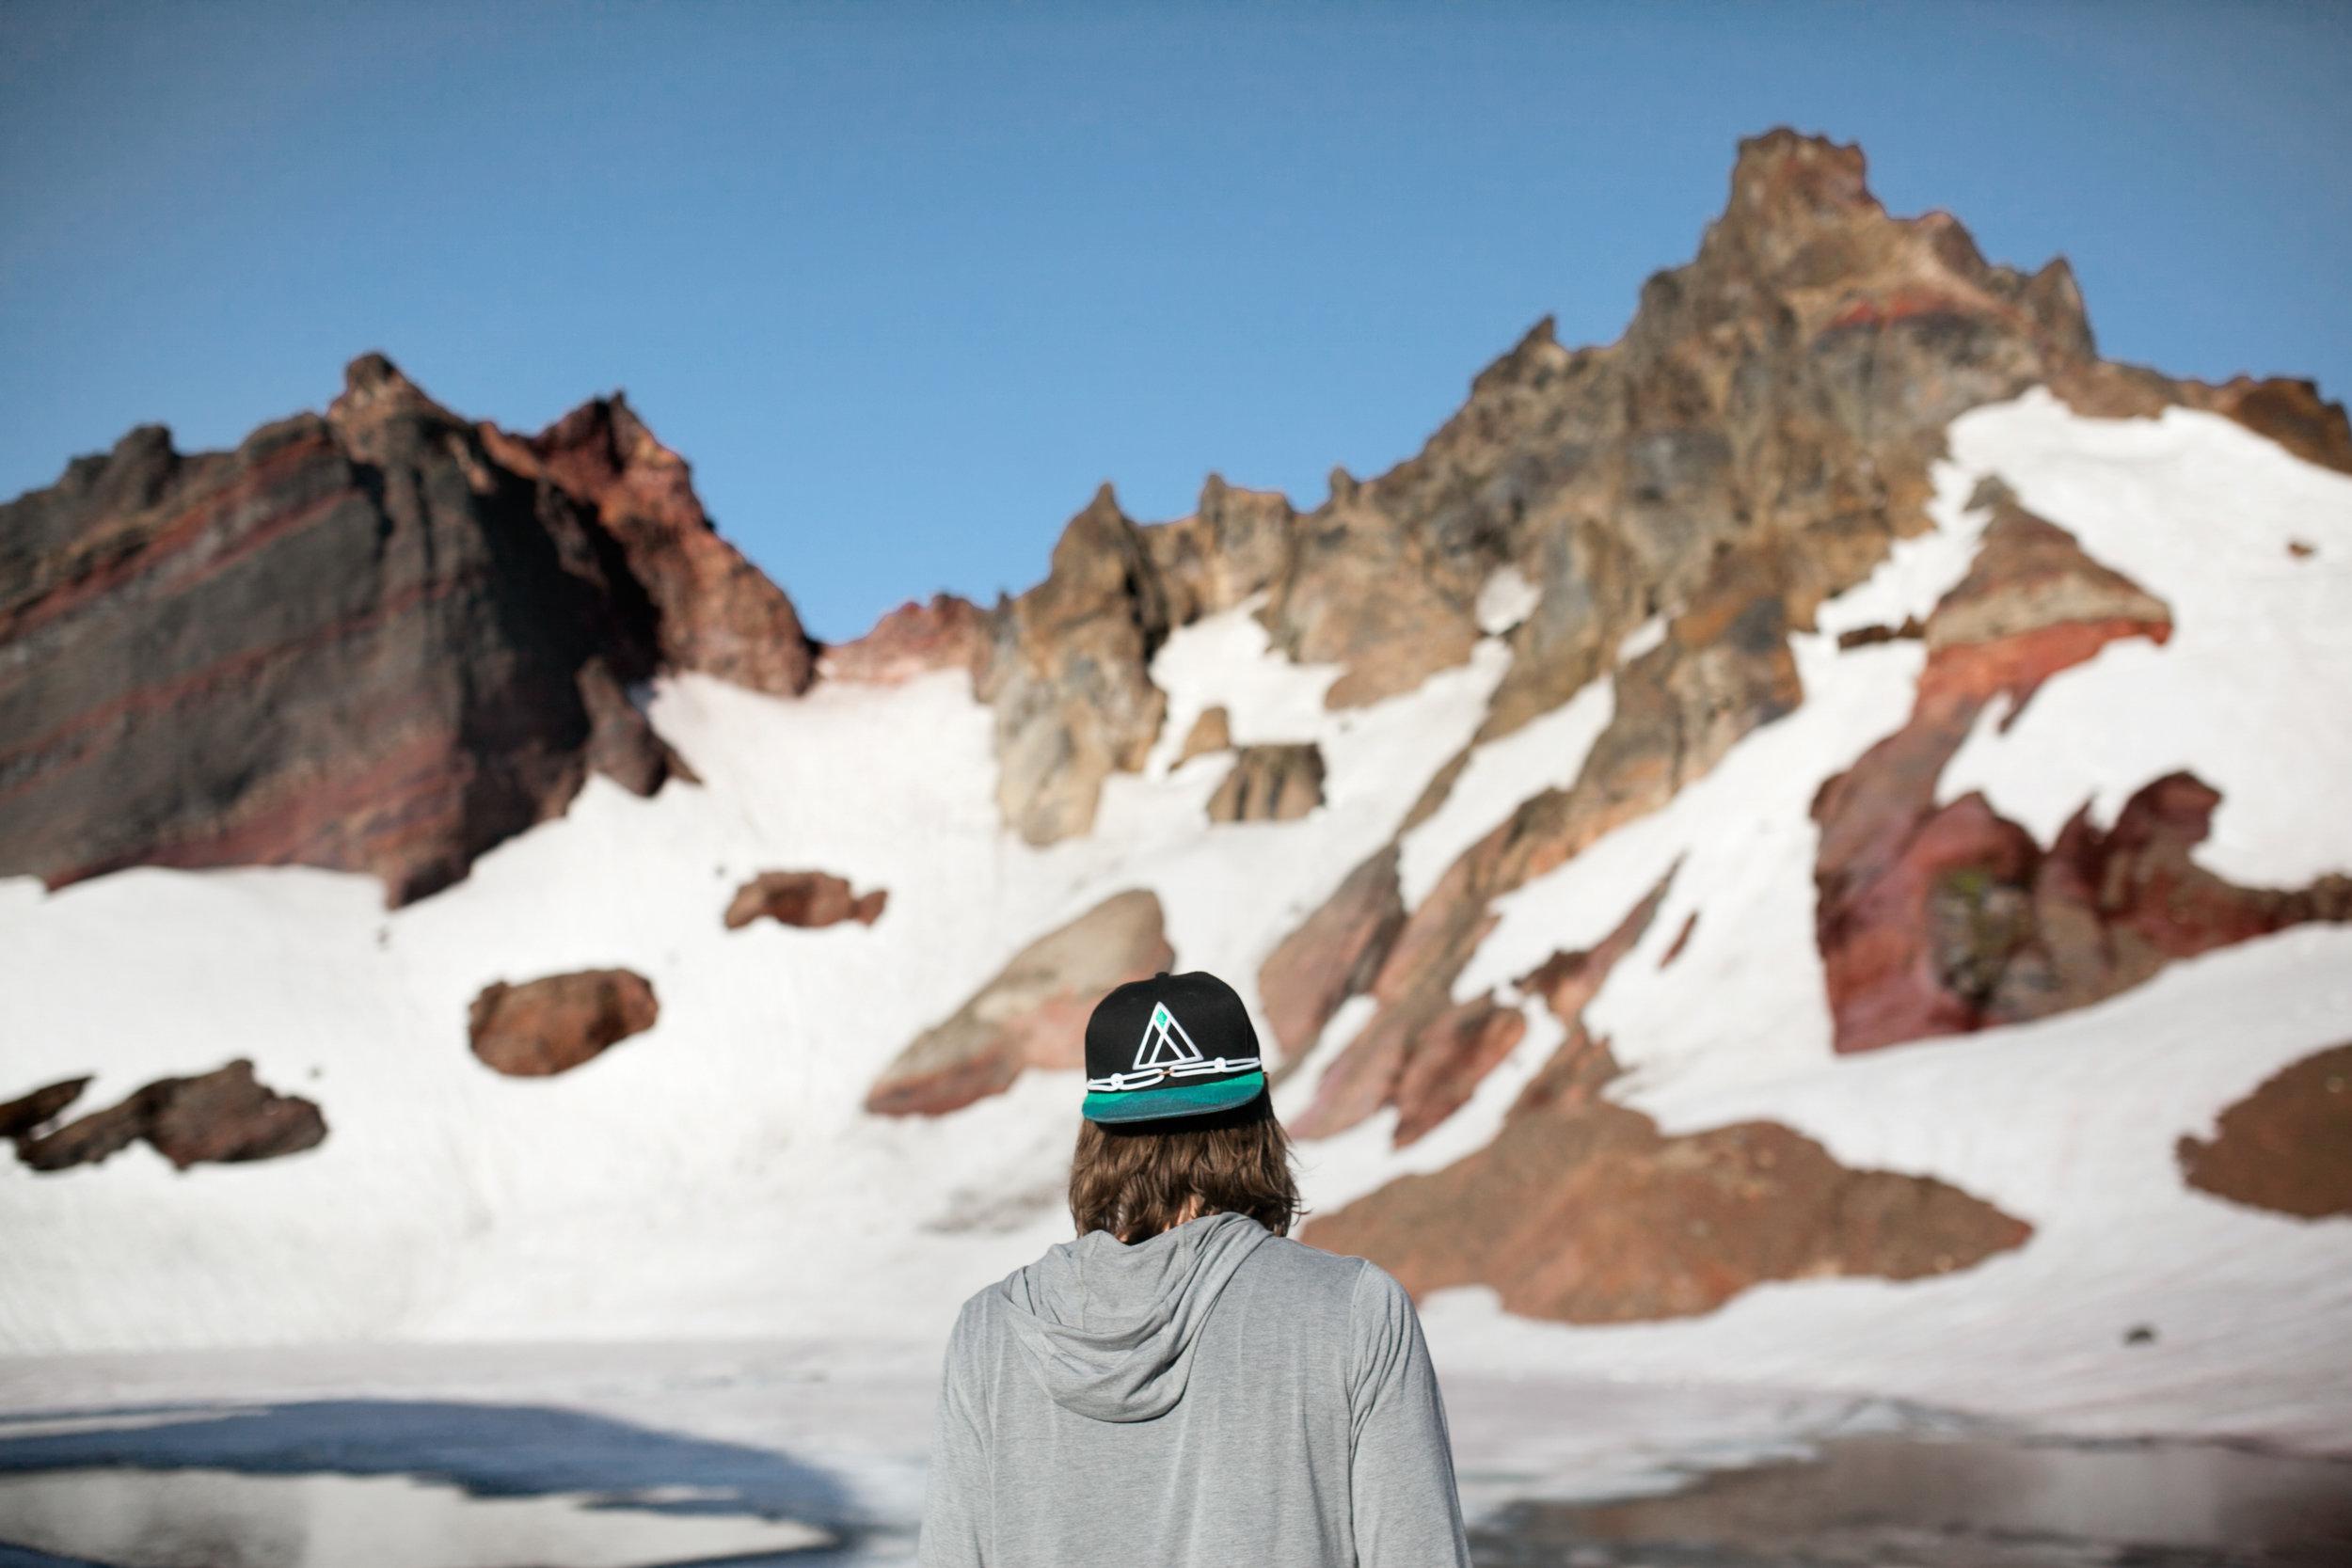 036Travel_Adventure_Photography_Outlive_Creative_Oregon_Broken_Top.jpg